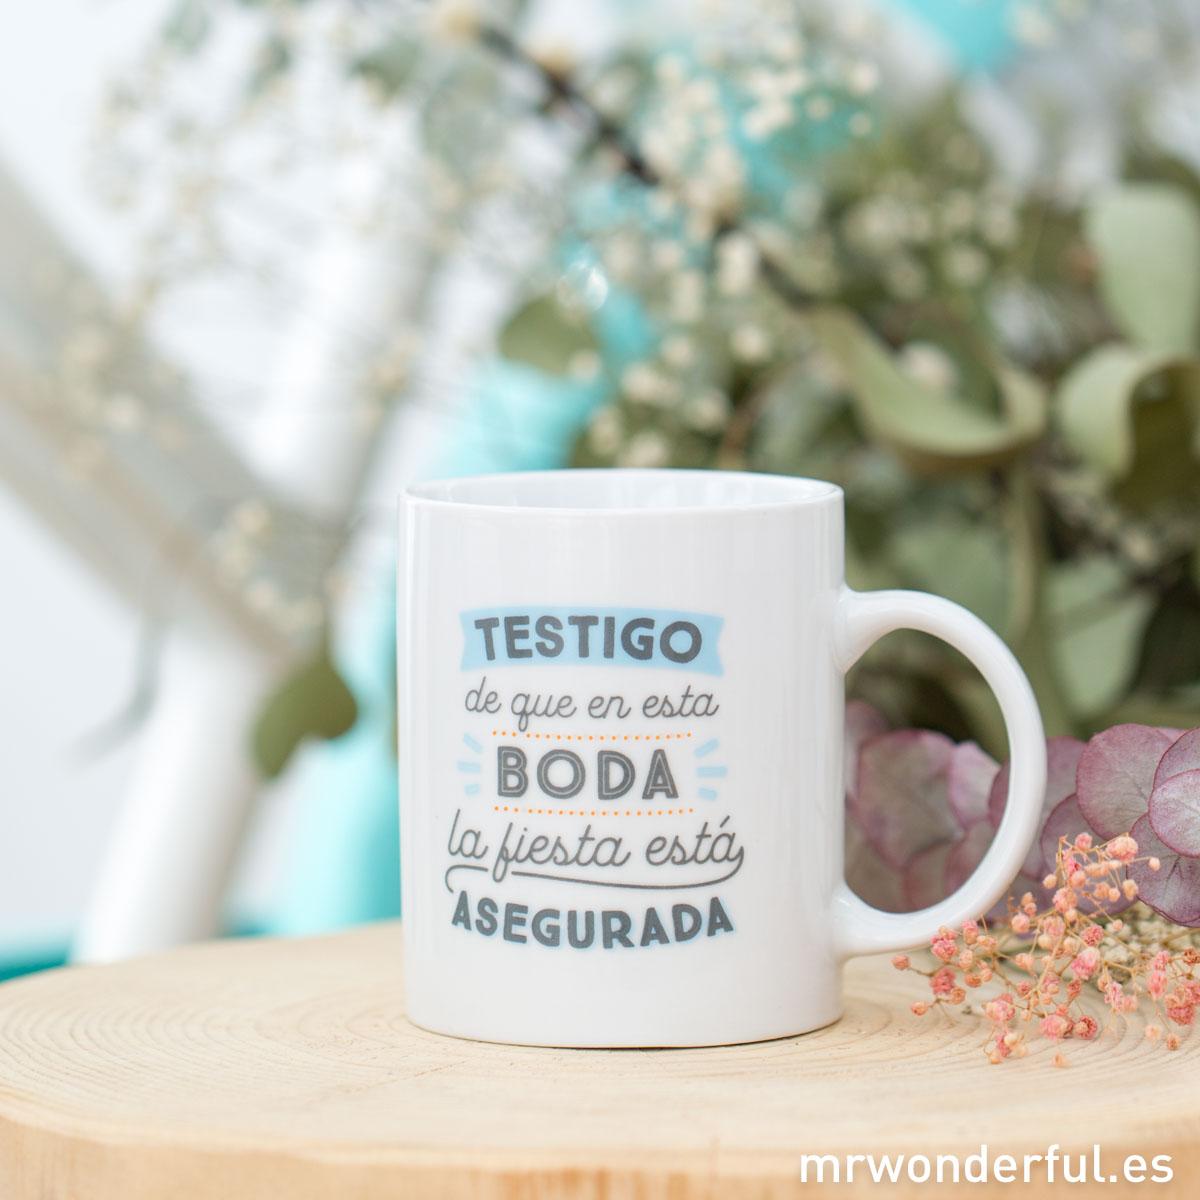 mrwonderful_8435460705905_WOA03502_Taza-Testigo-de-que-en-esa-boda-la-fiesta-esta-asegurada-CAST-25-Editar